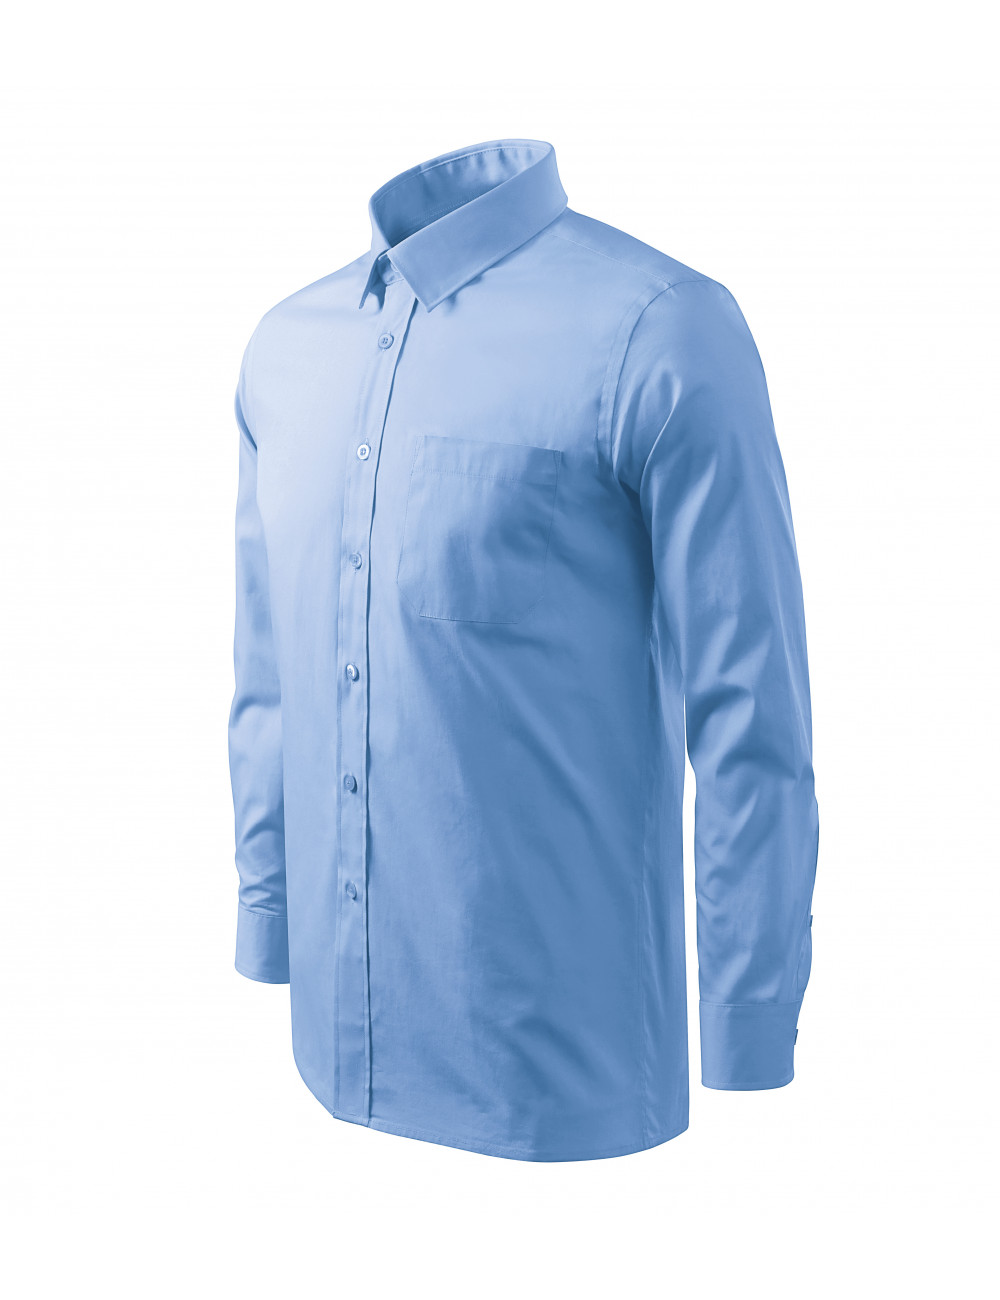 Adler MALFINI Koszula męska Style LS 209 błękitny